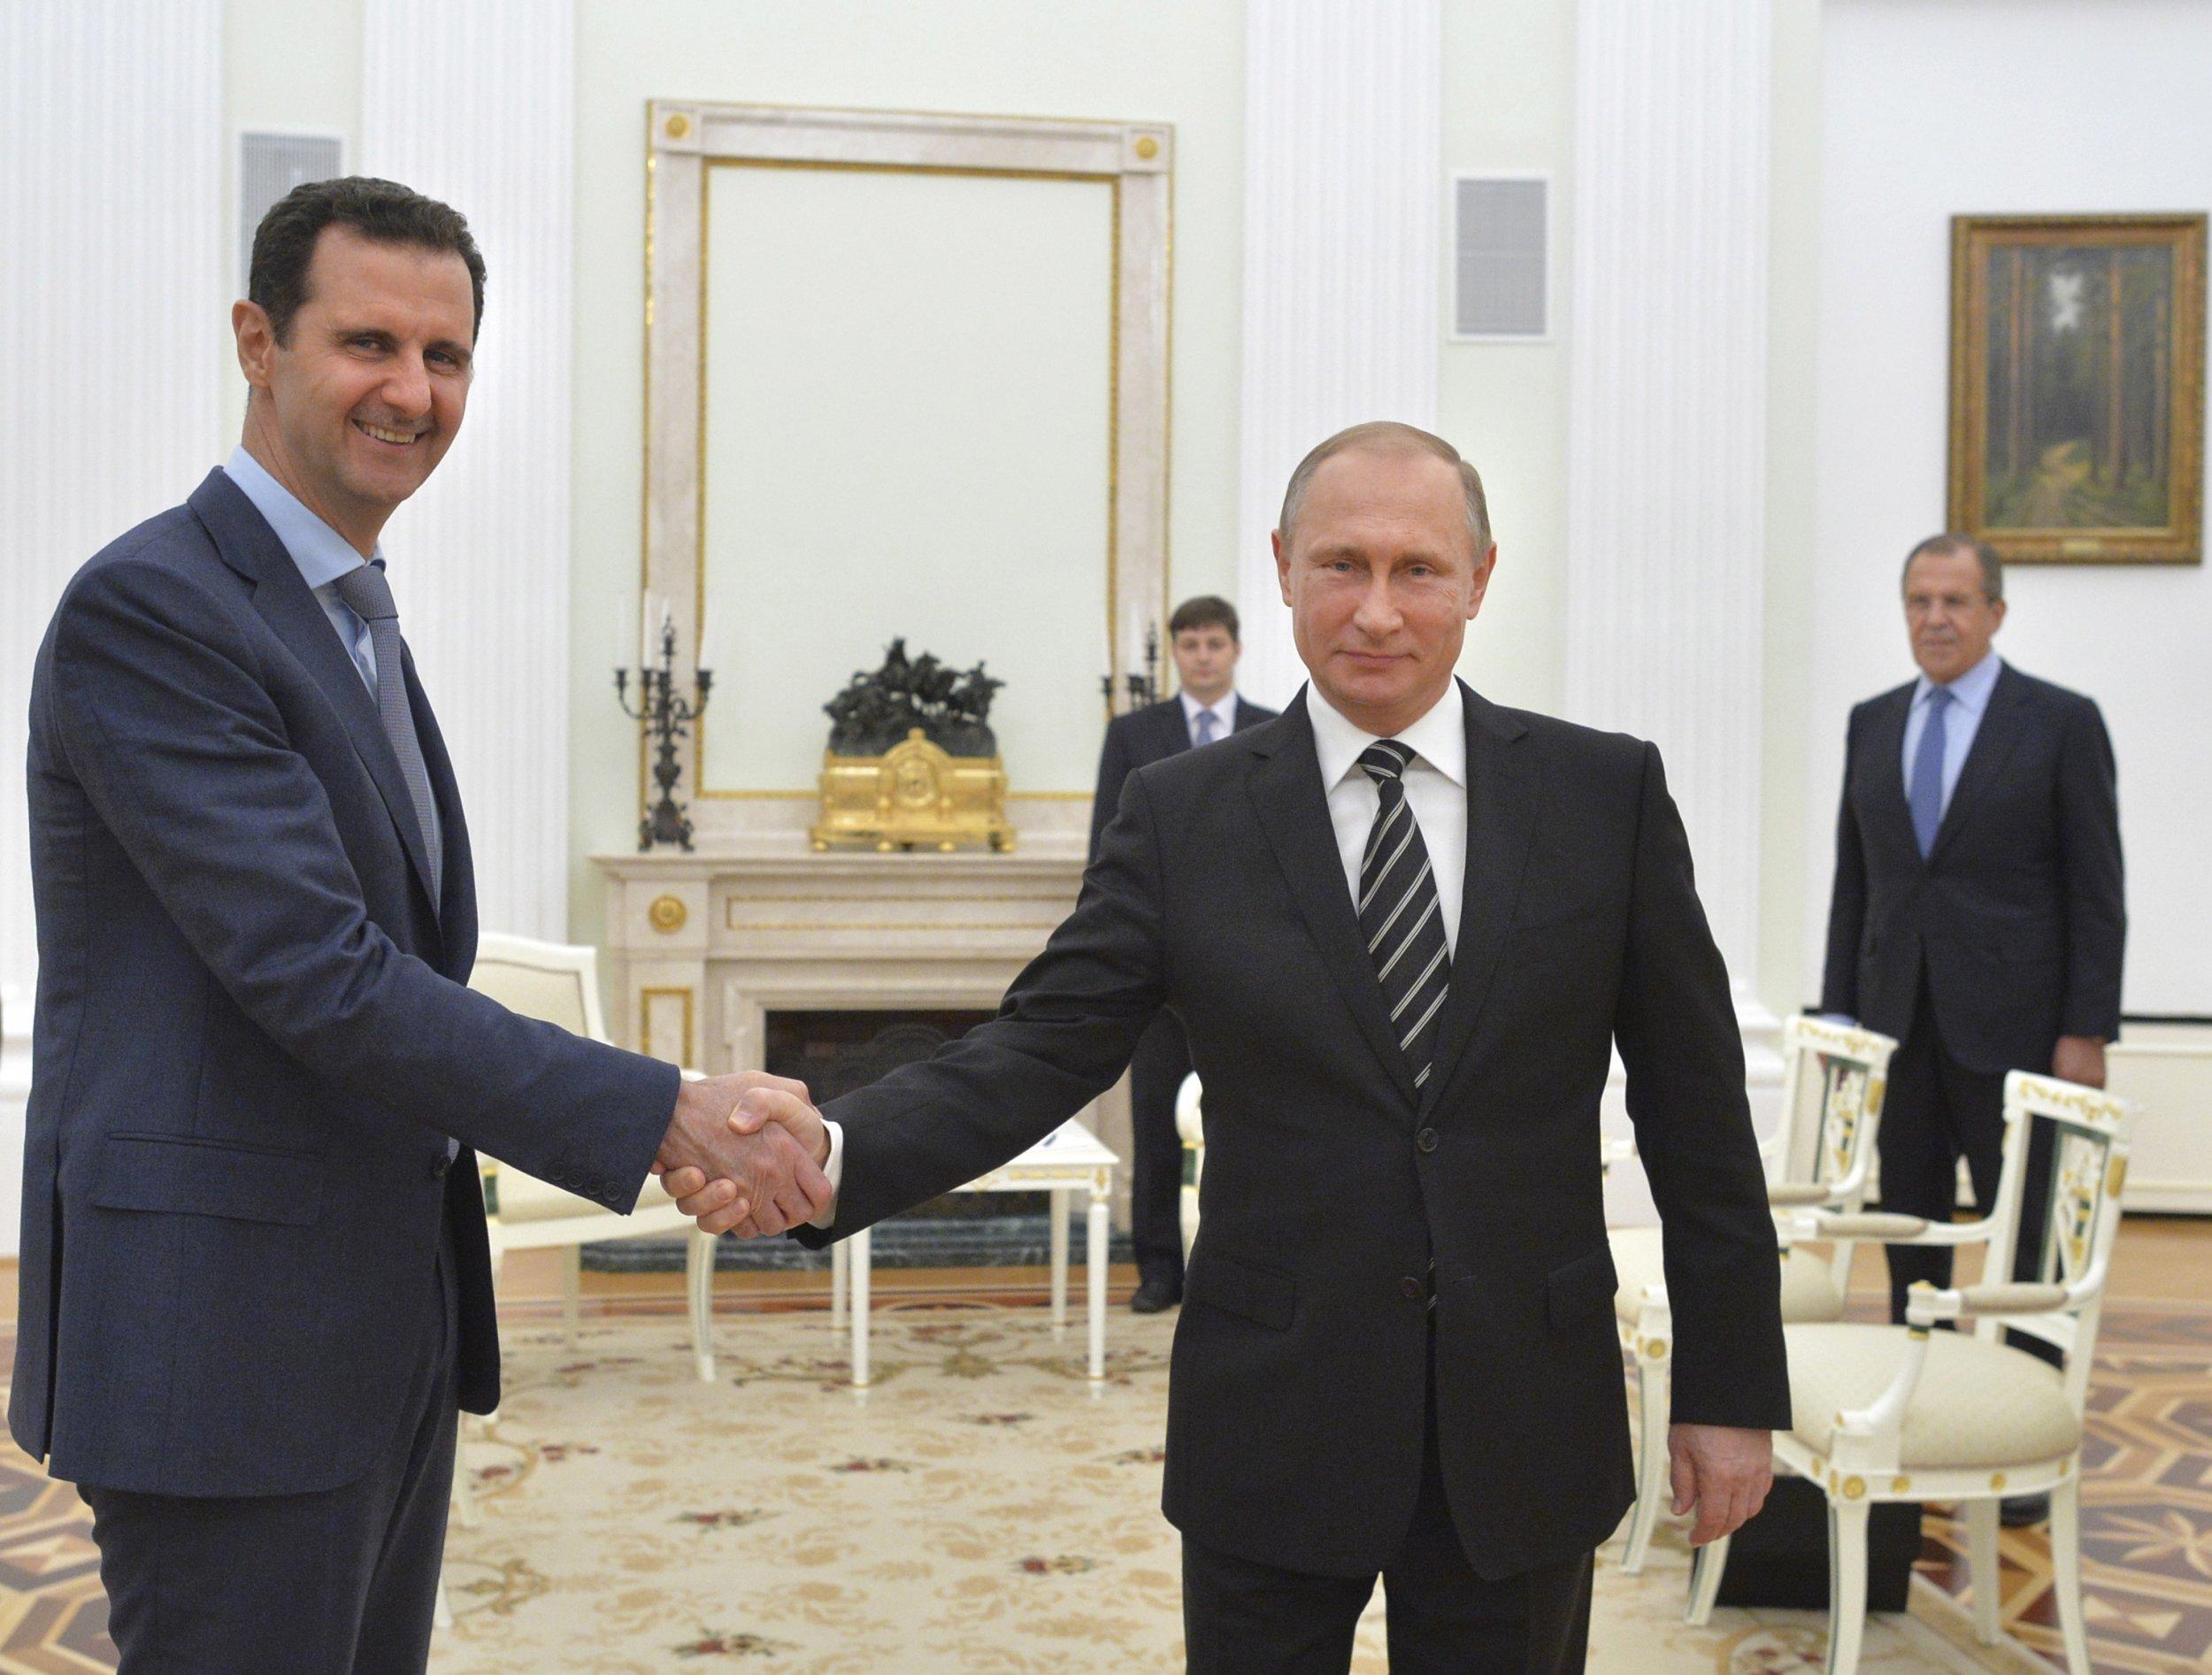 Putin and Assad shake hands